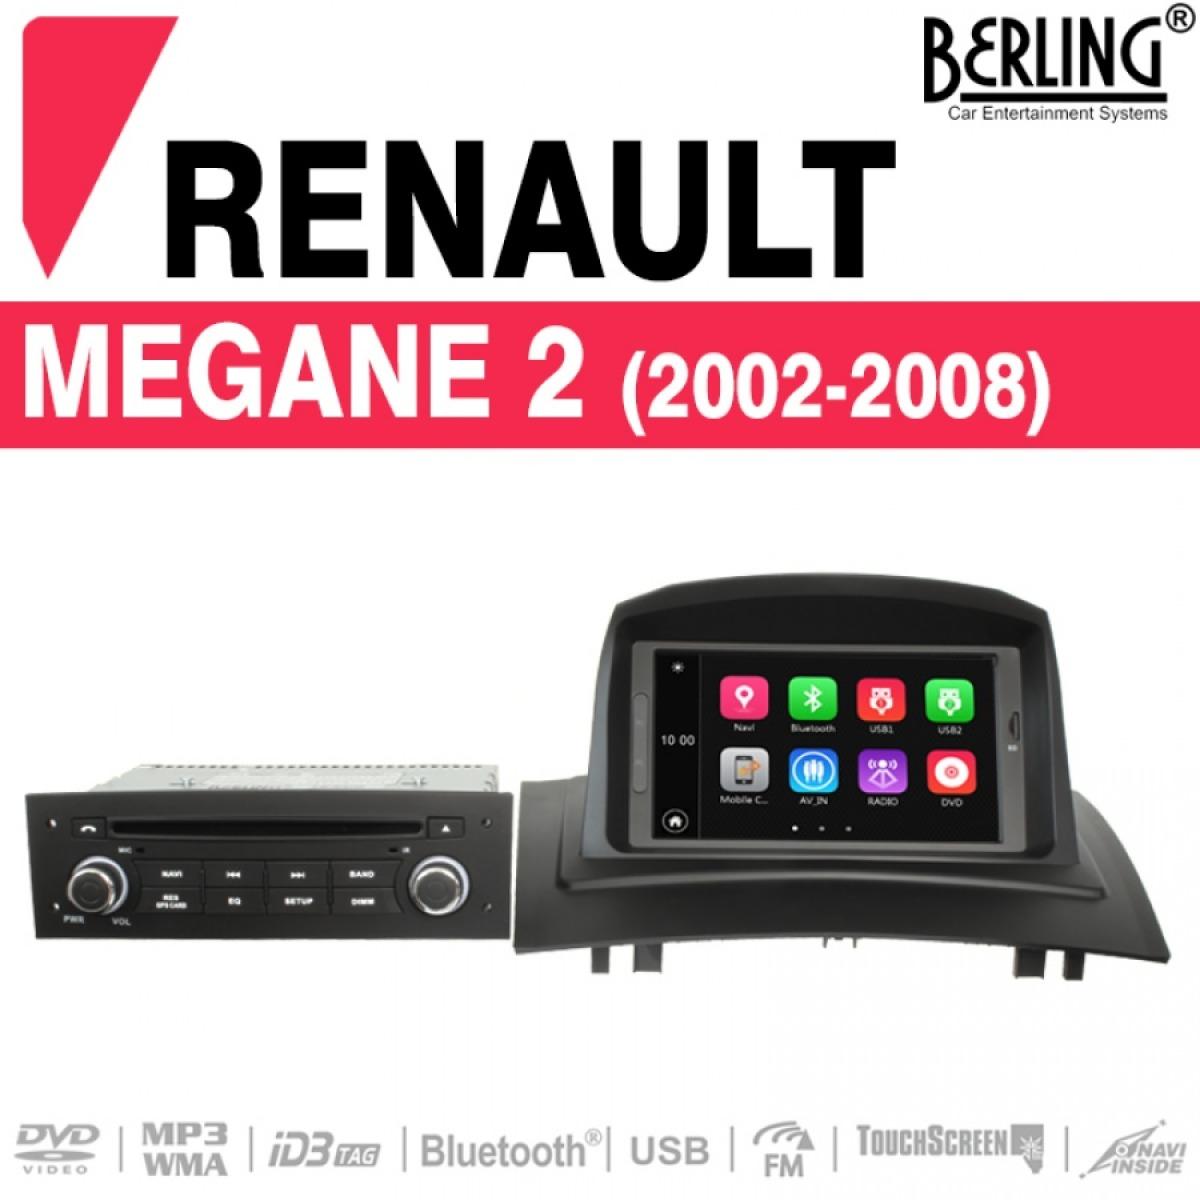 autoradio navigation f r renault megane 2002 2008. Black Bedroom Furniture Sets. Home Design Ideas